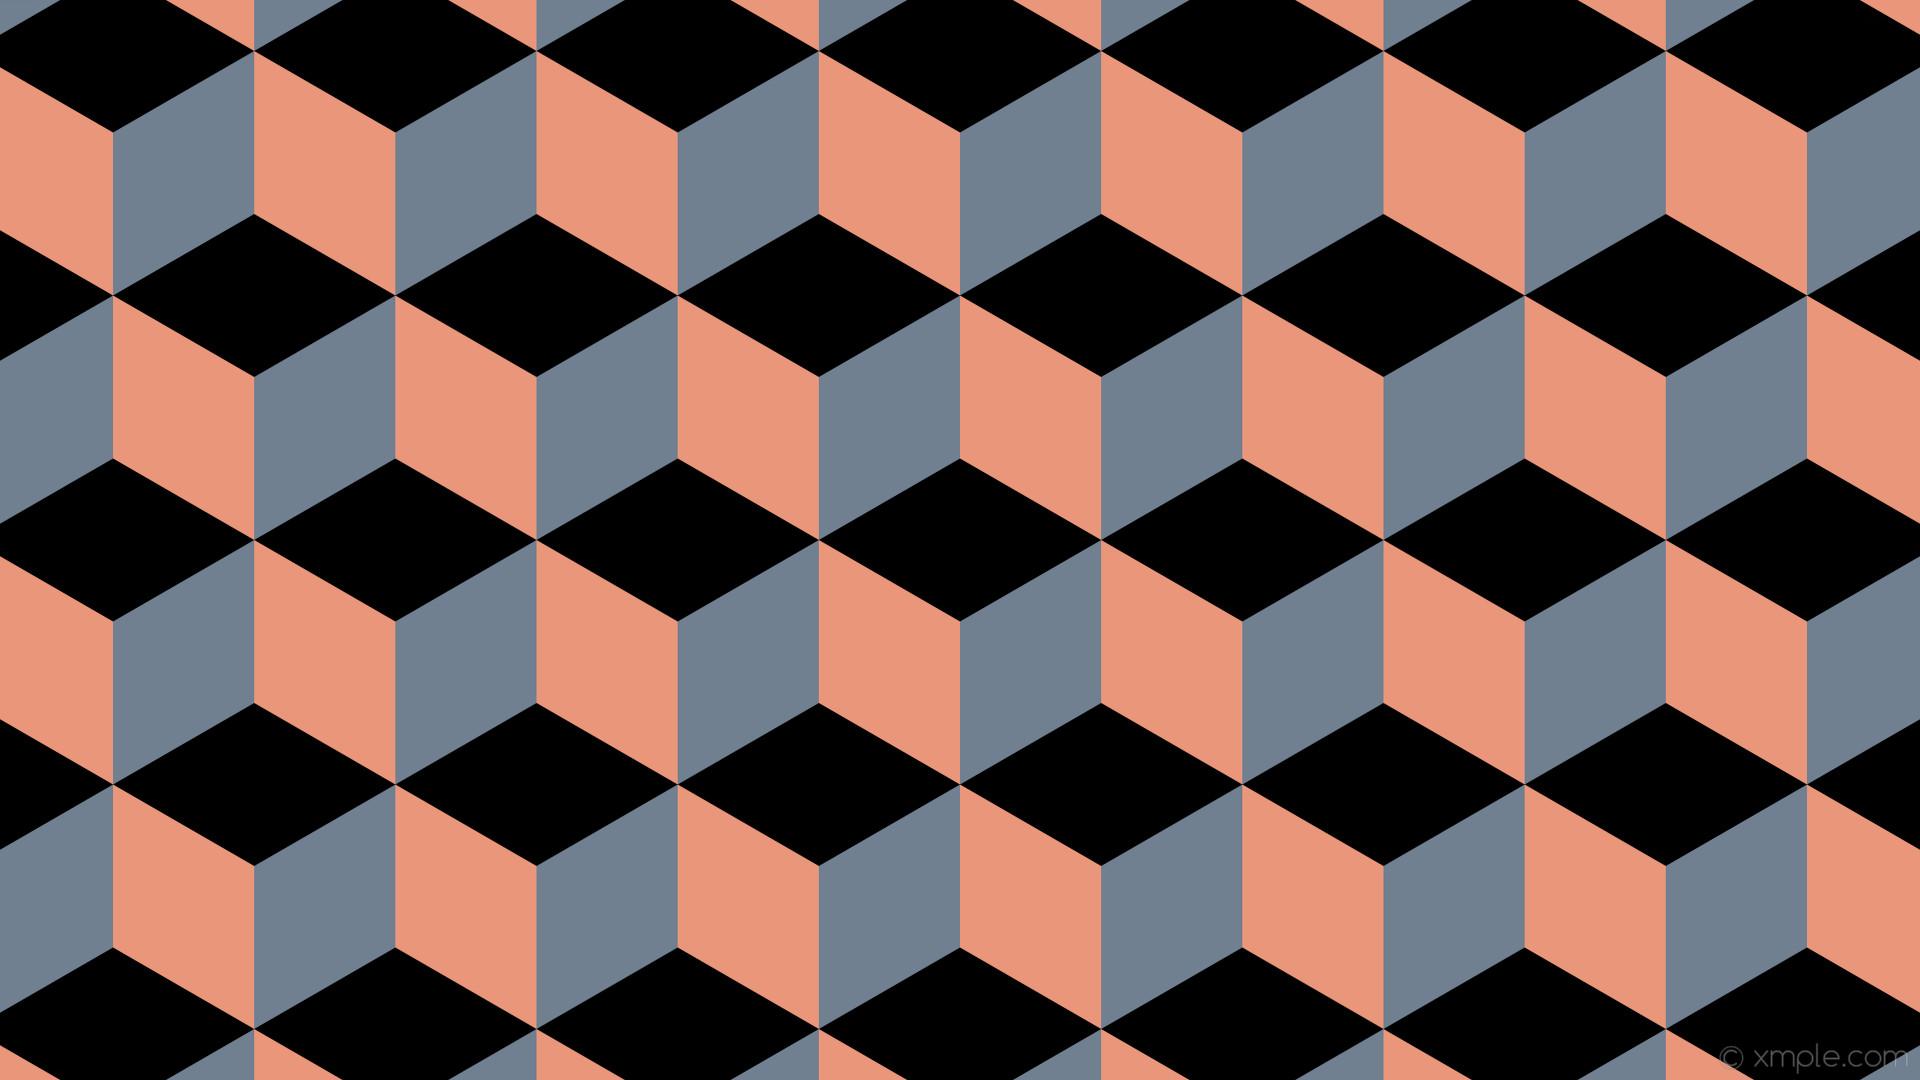 wallpaper grey 3d cubes red black dark salmon slate gray #000000 #e9967a  #708090